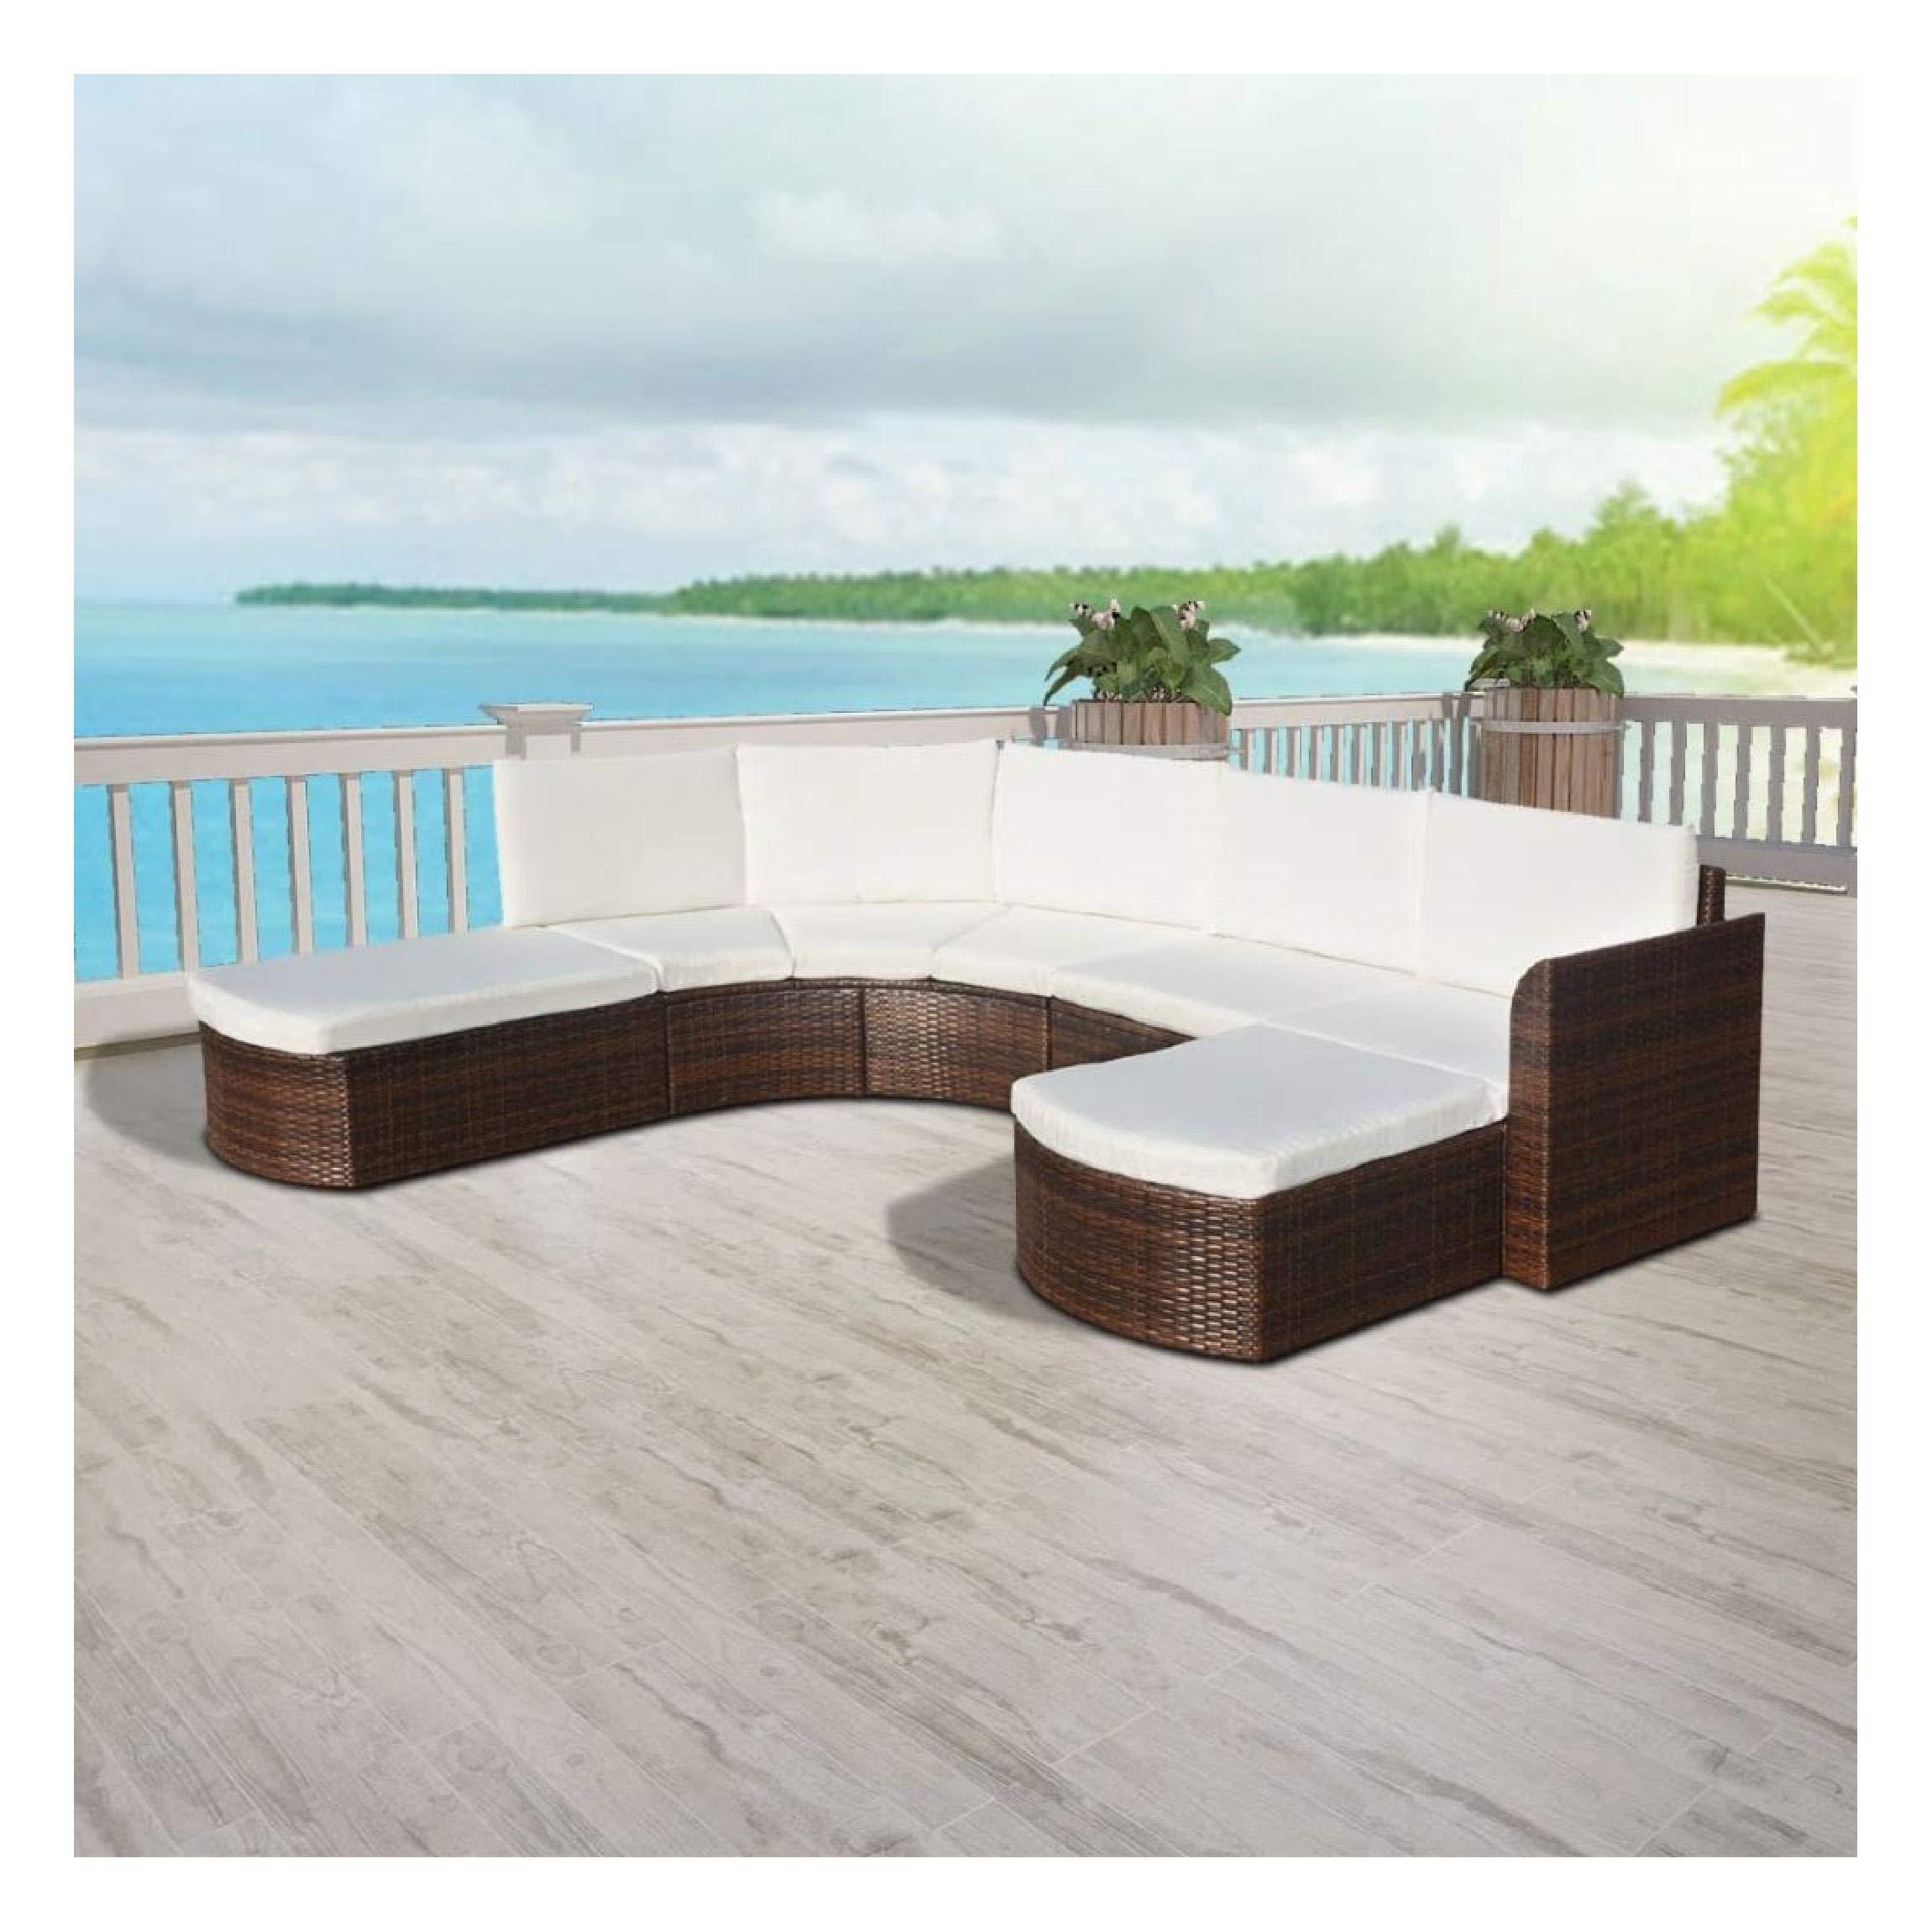 HEATAPPLY Outdoor Furniture Set, 4 Piece Garden Lounge Set with Cushions Poly Rattan Brown by HEATAPPLY